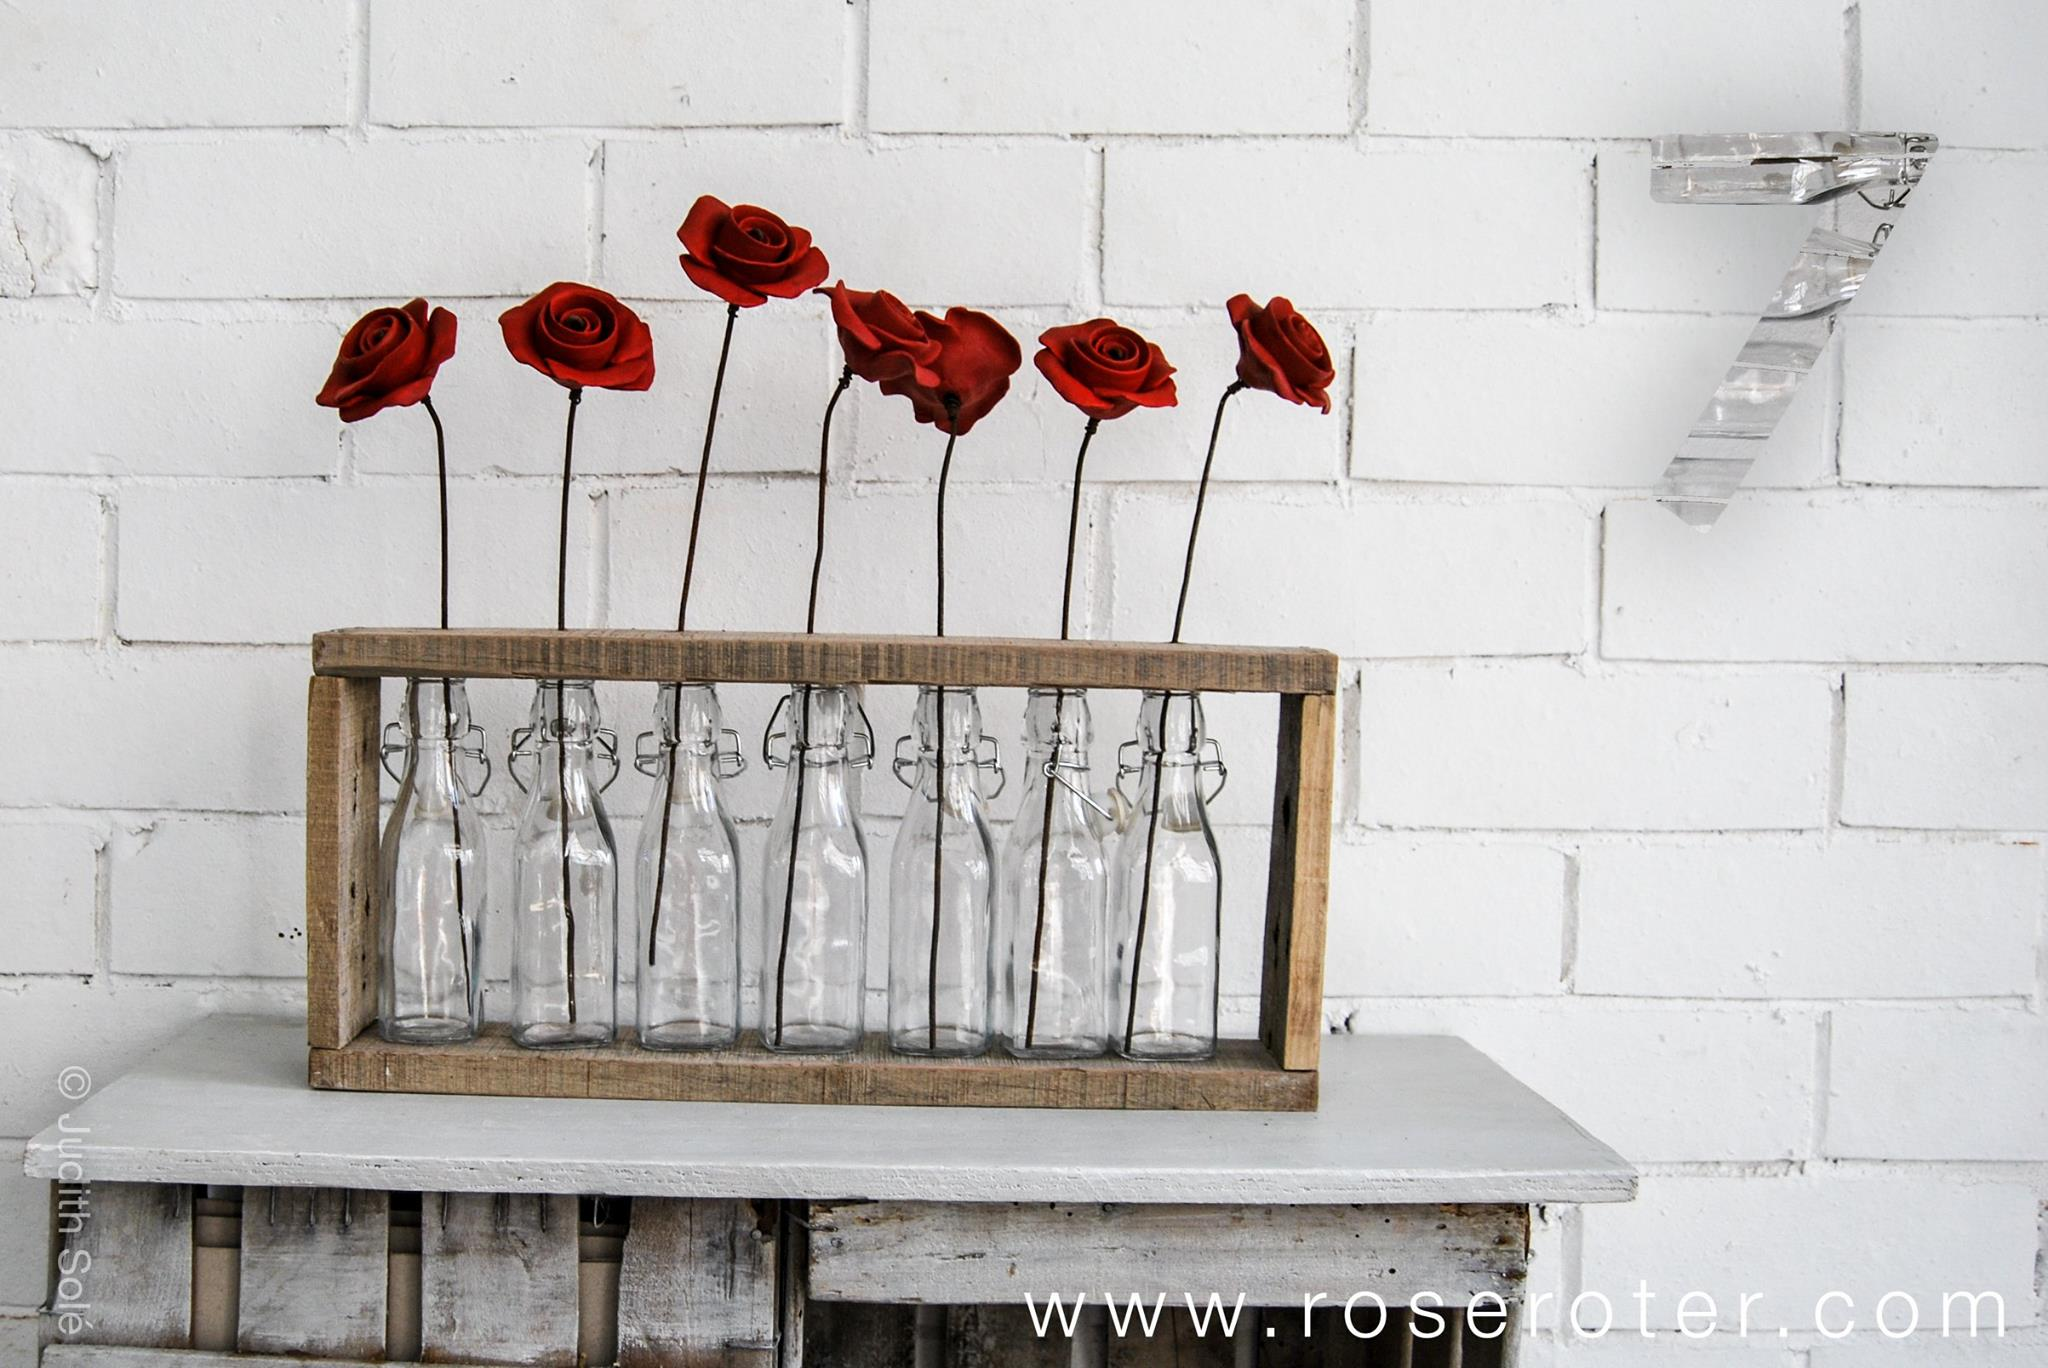 roseroter